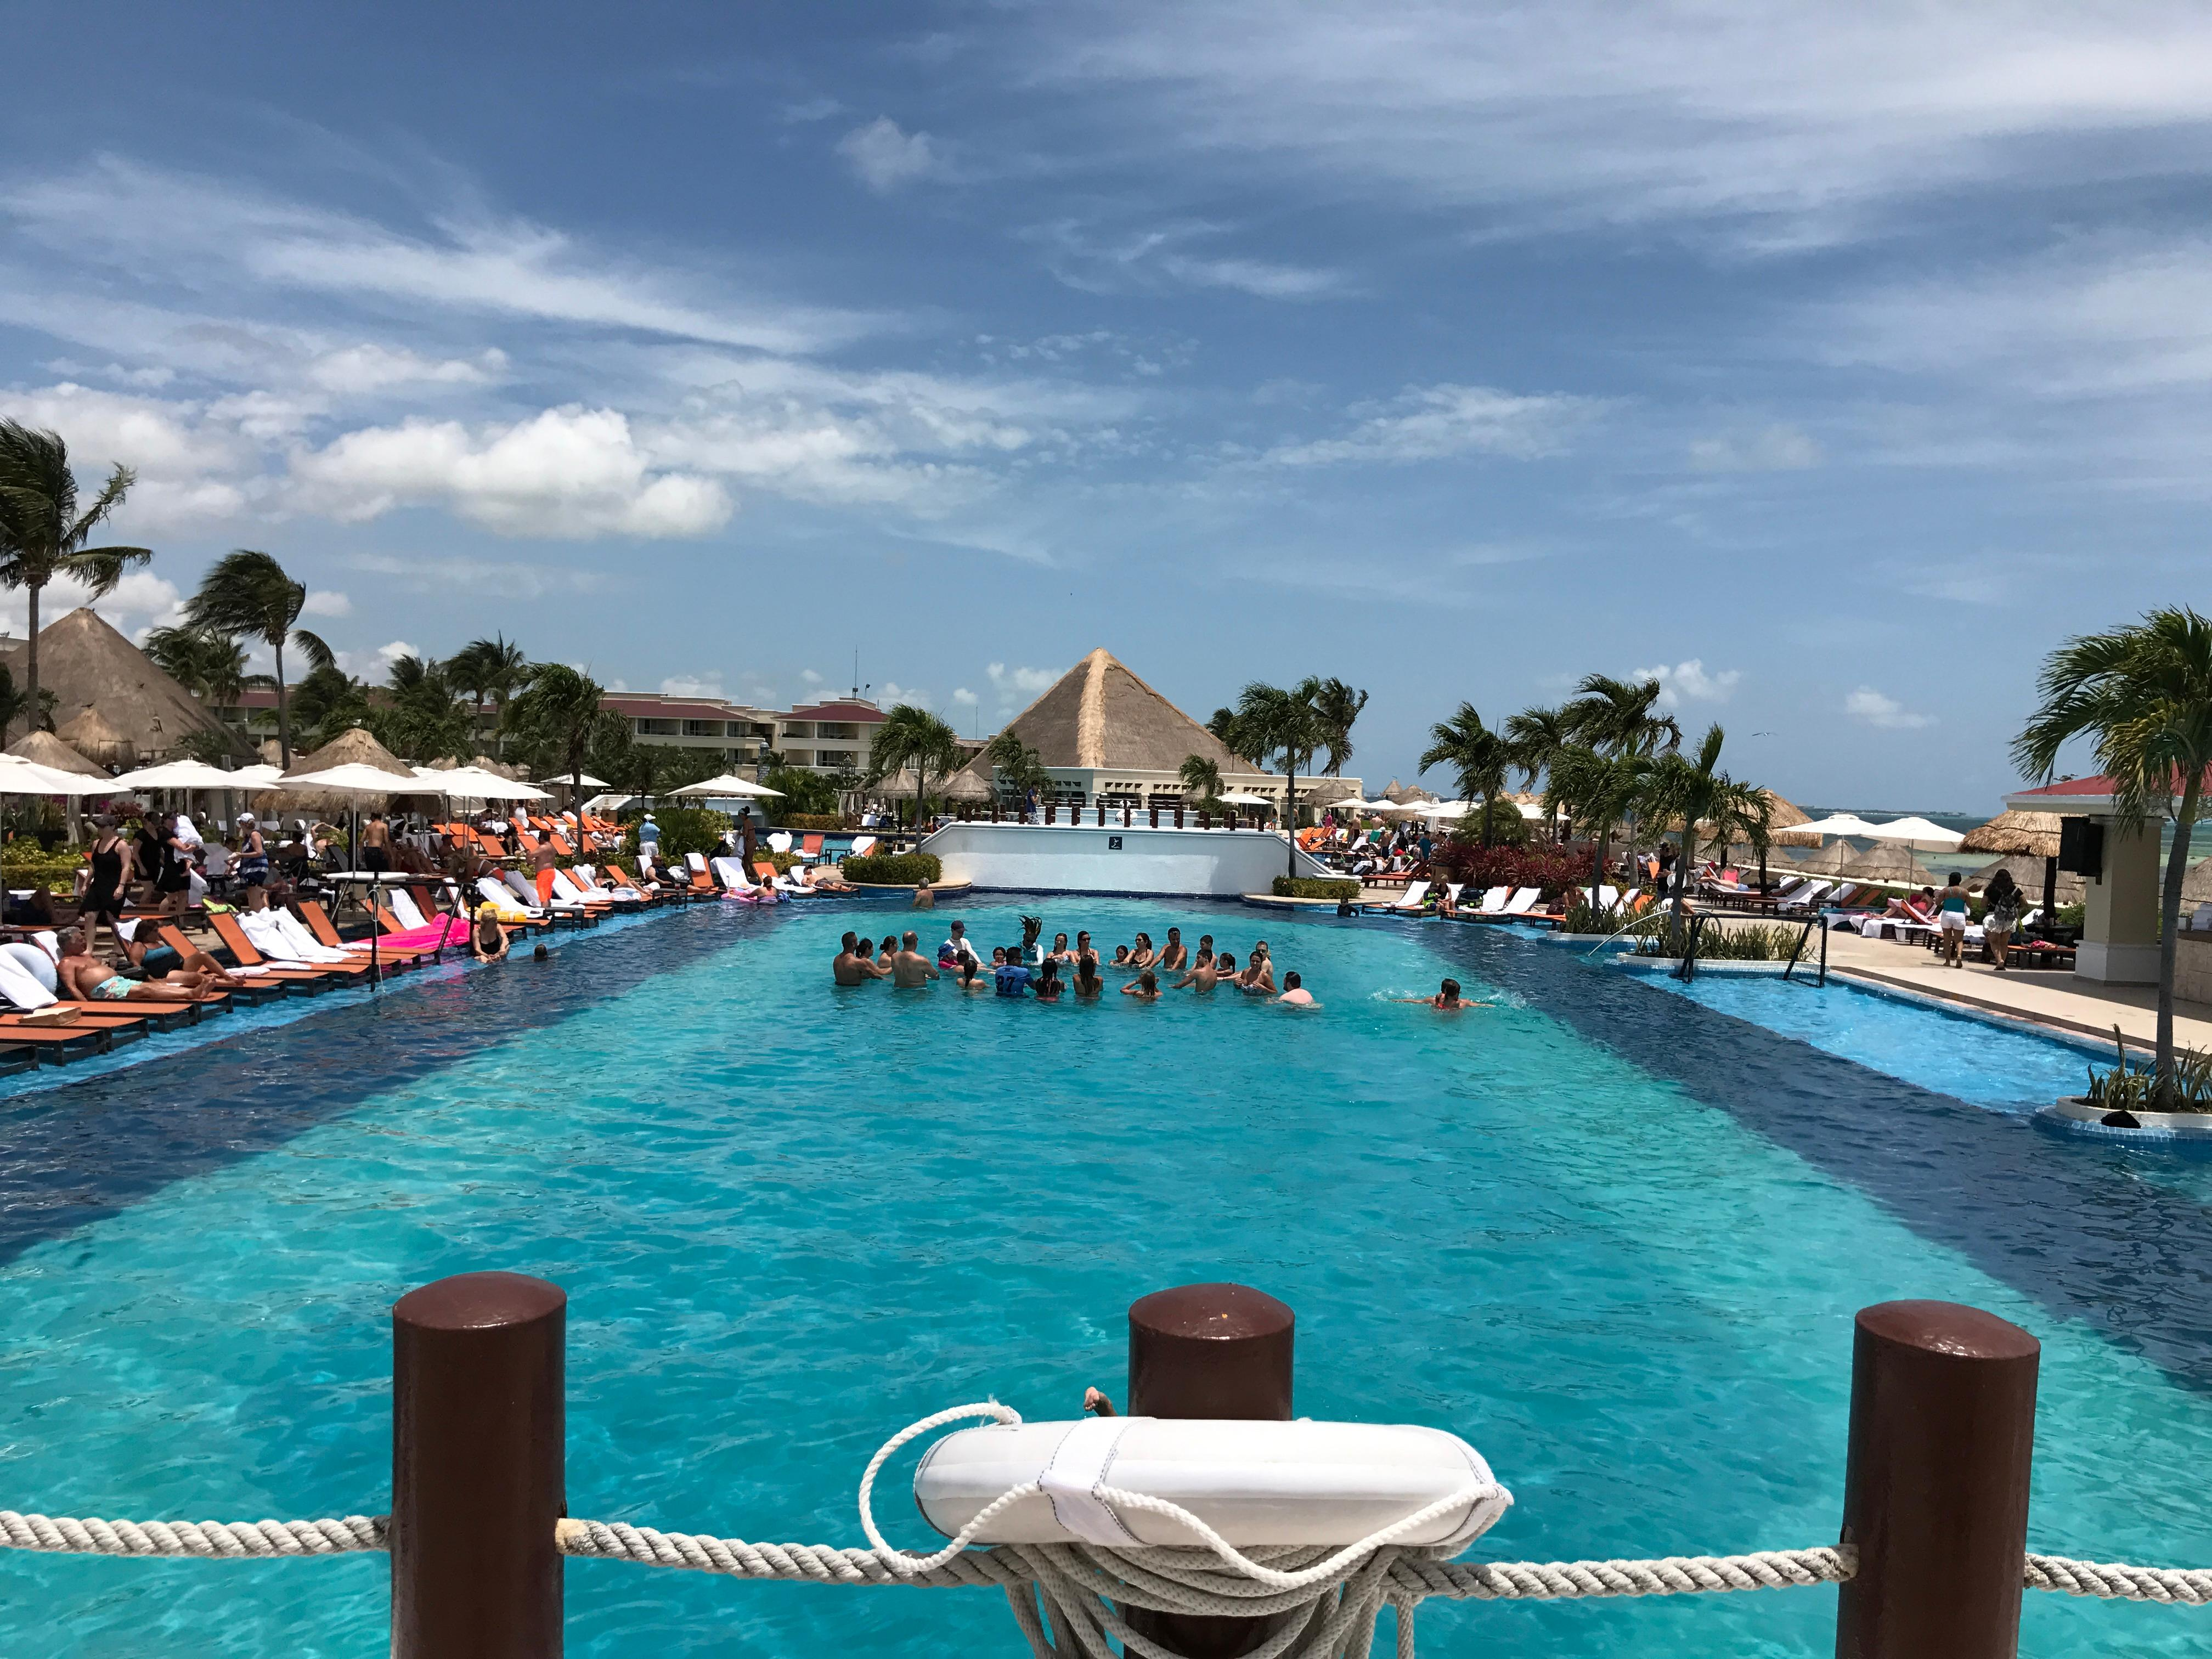 Sunrise Resort, Cancun Mexico